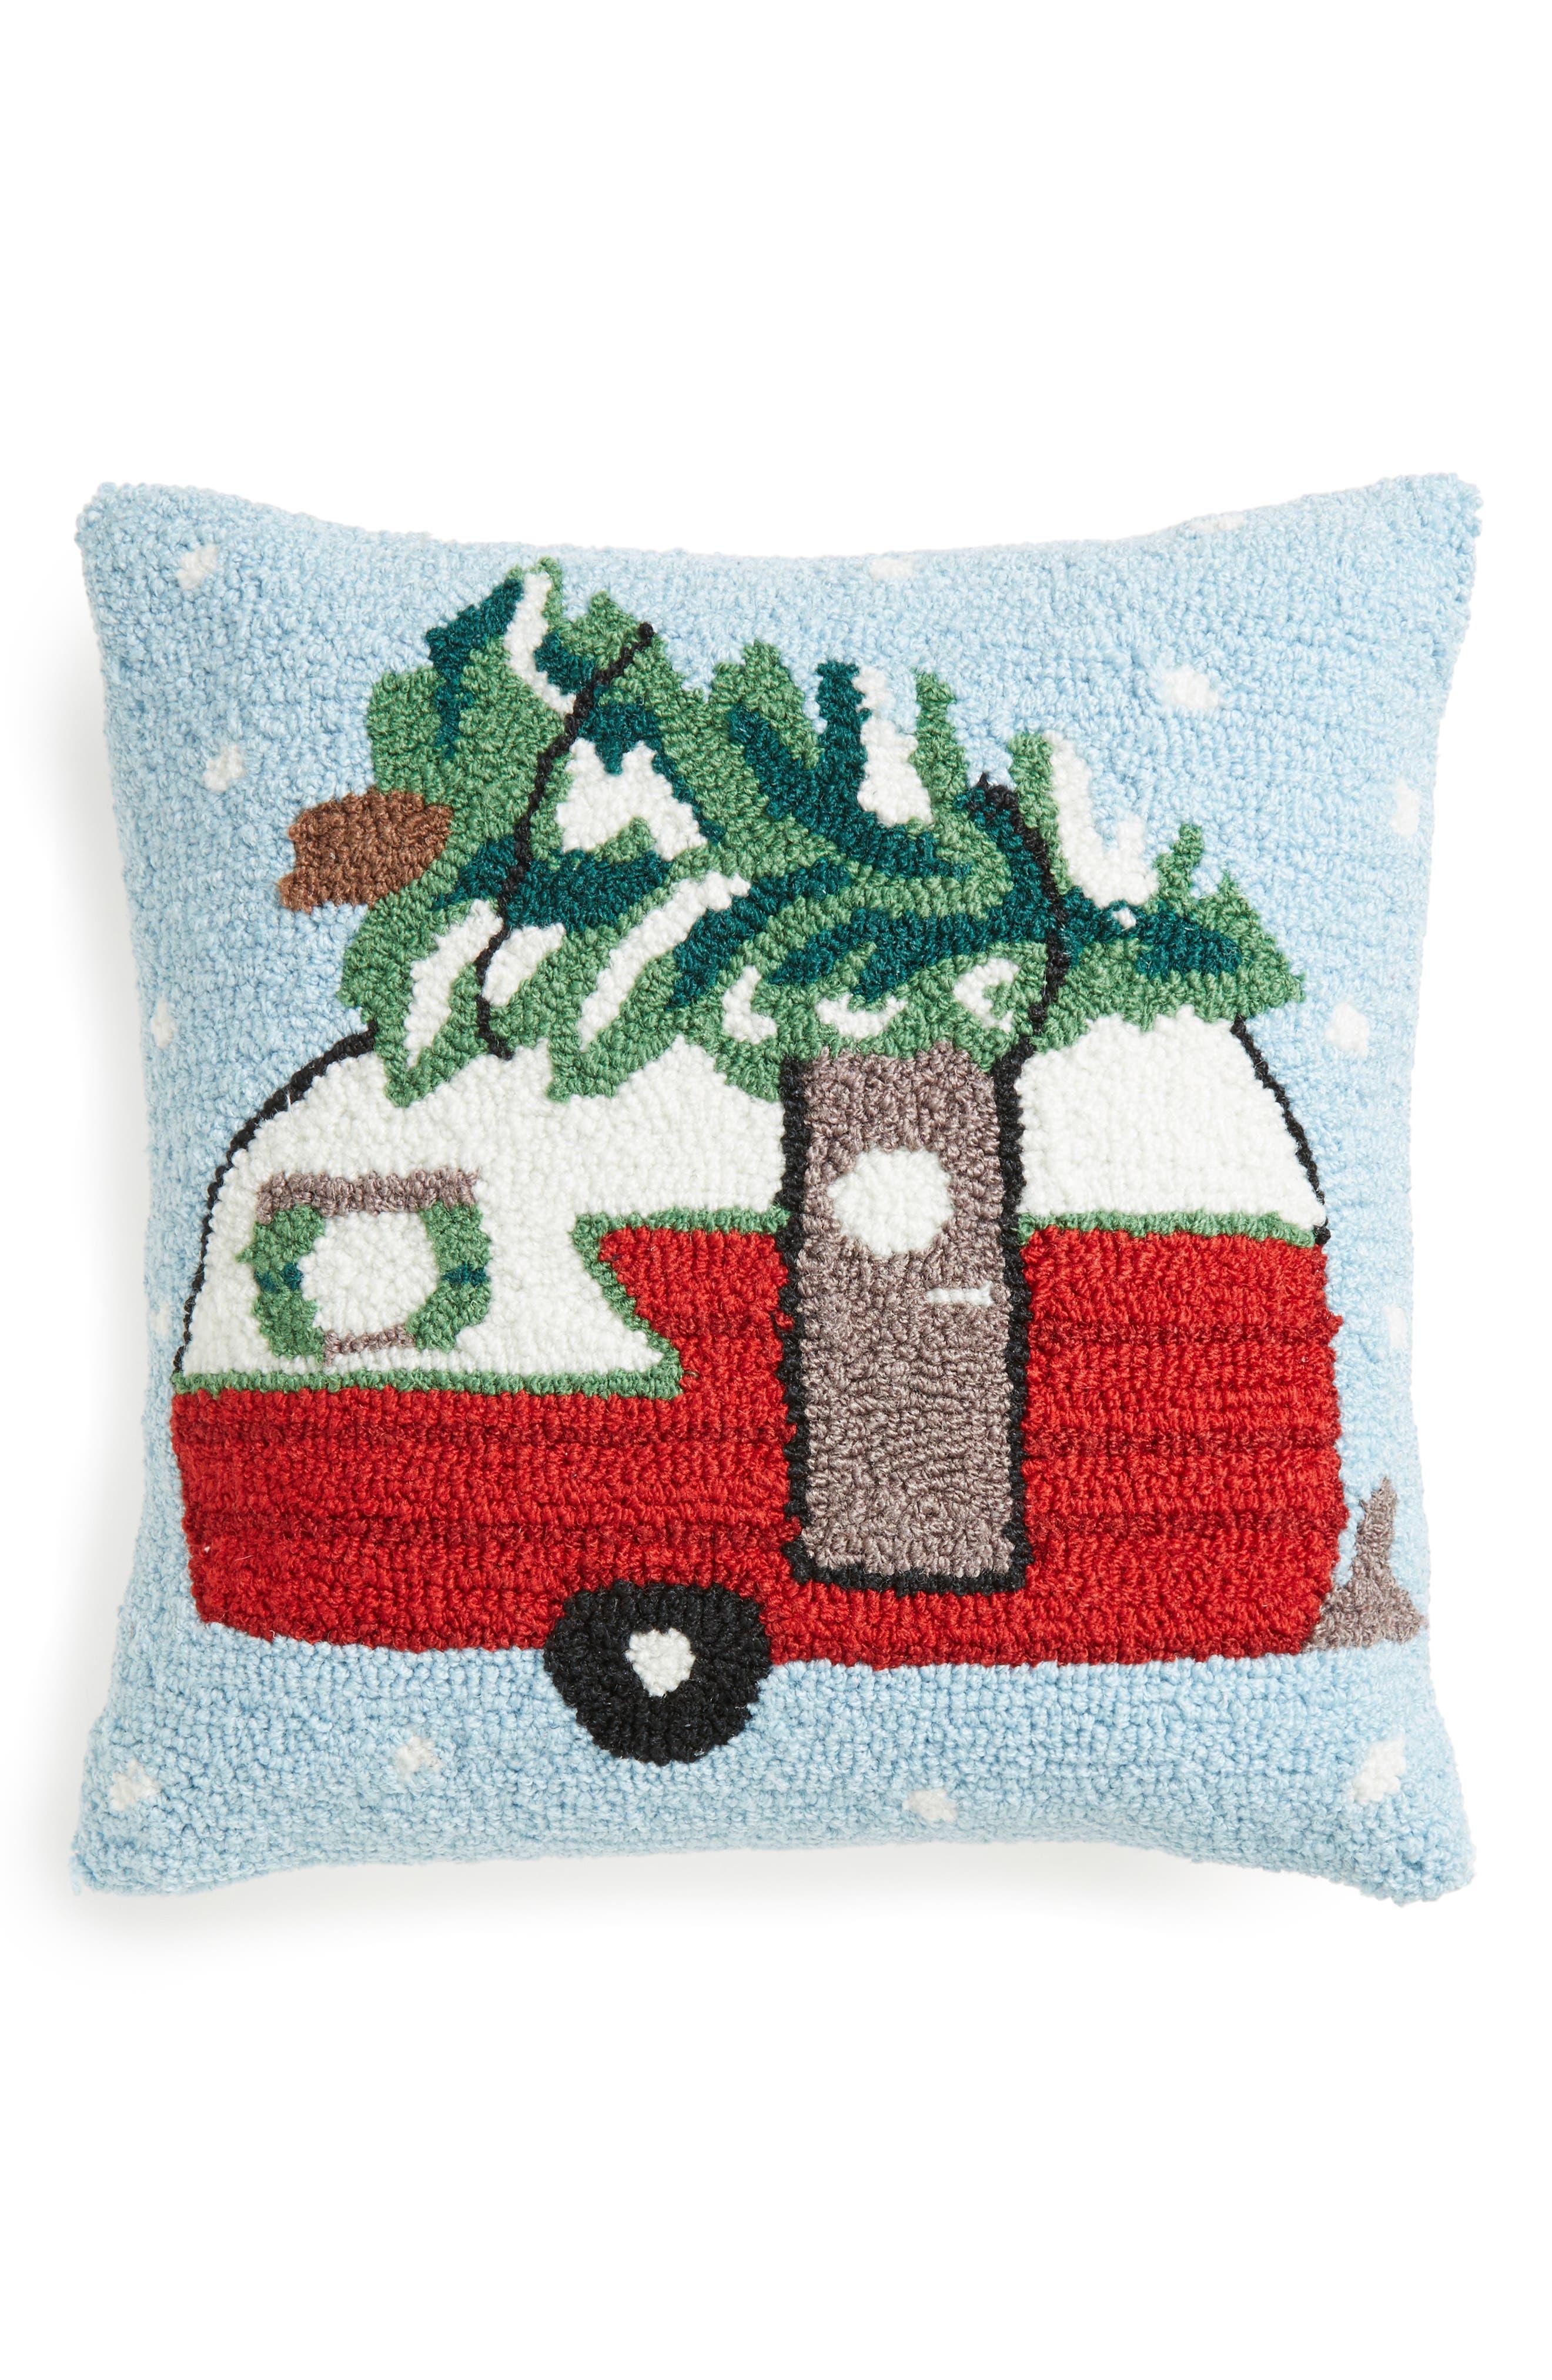 Main Image - Peking Handicraft Christmas Tree Camper Hooked Accent Pillow